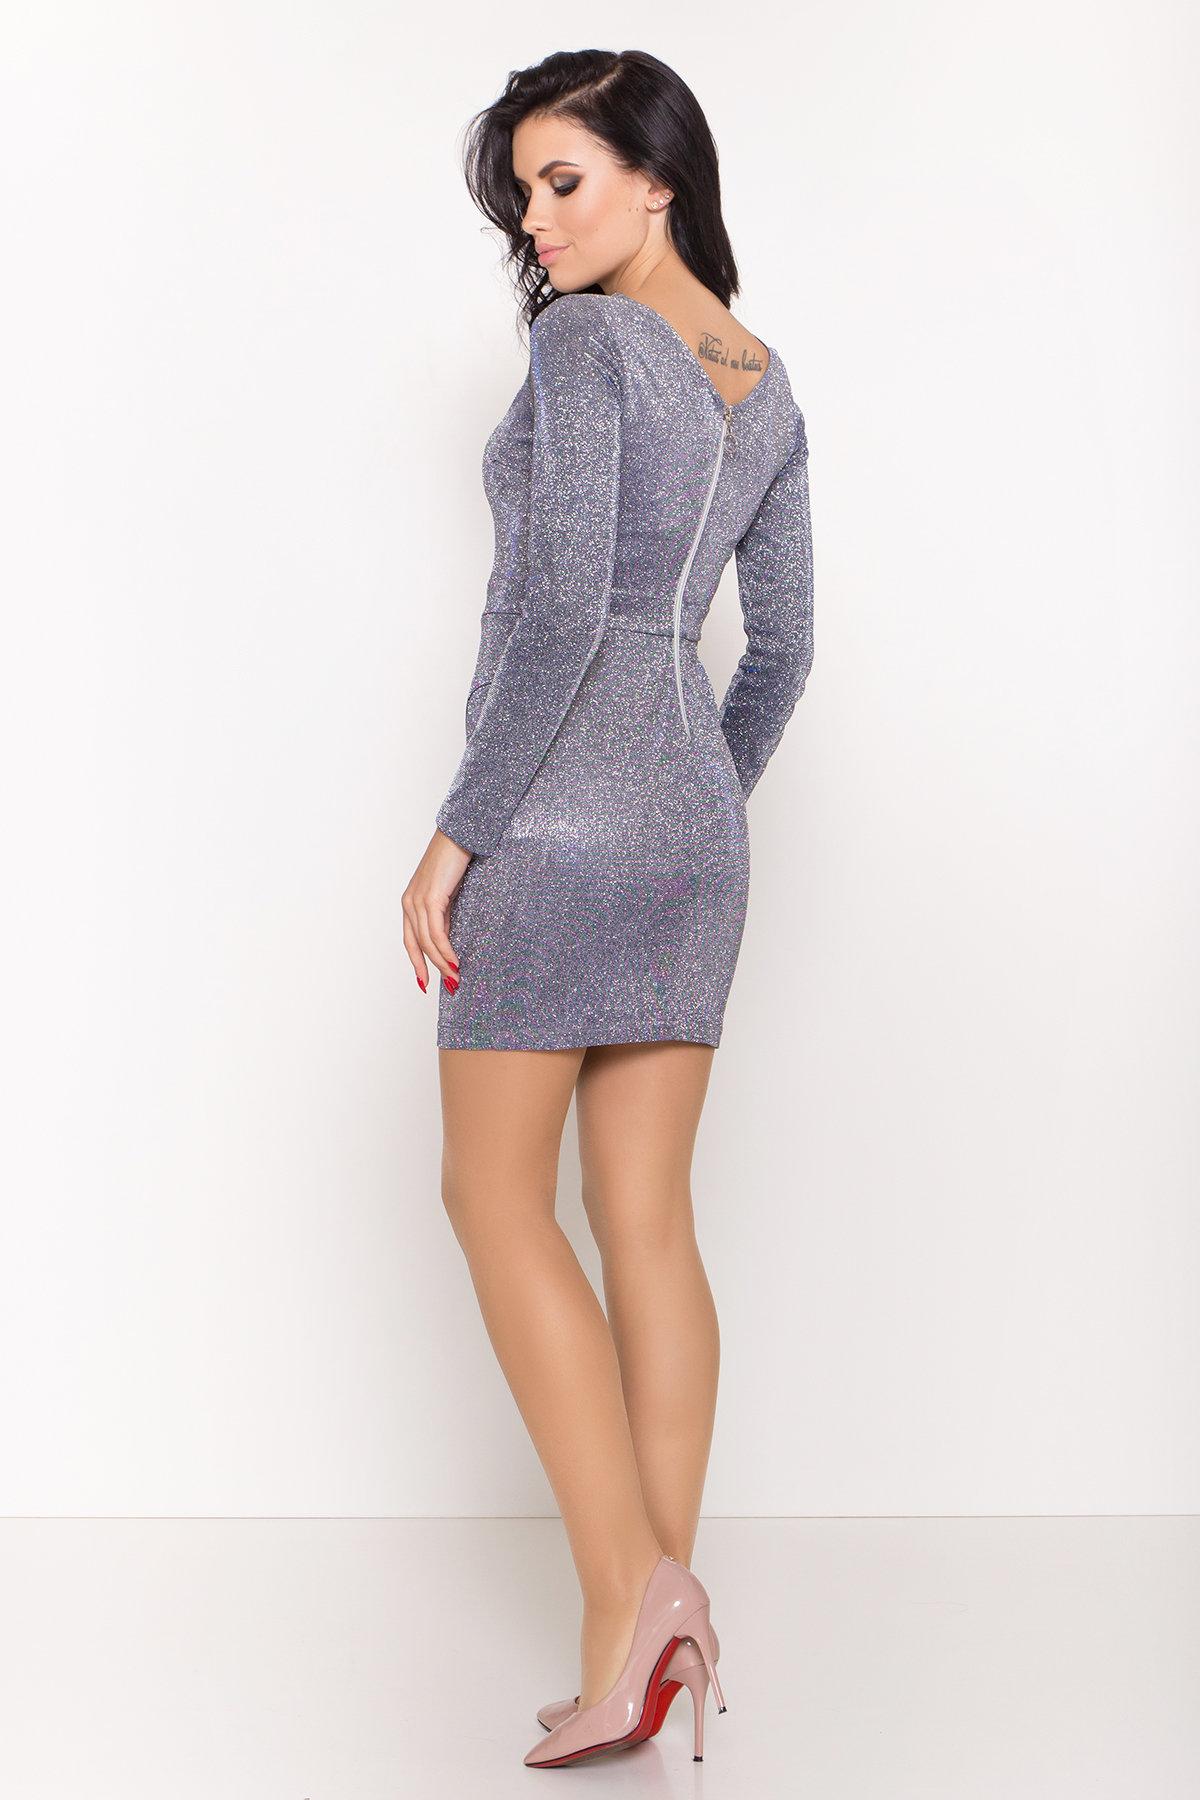 Коктейльное платье Кристал 8346 АРТ. 44717 Цвет: Серебро/электрик - фото 5, интернет магазин tm-modus.ru